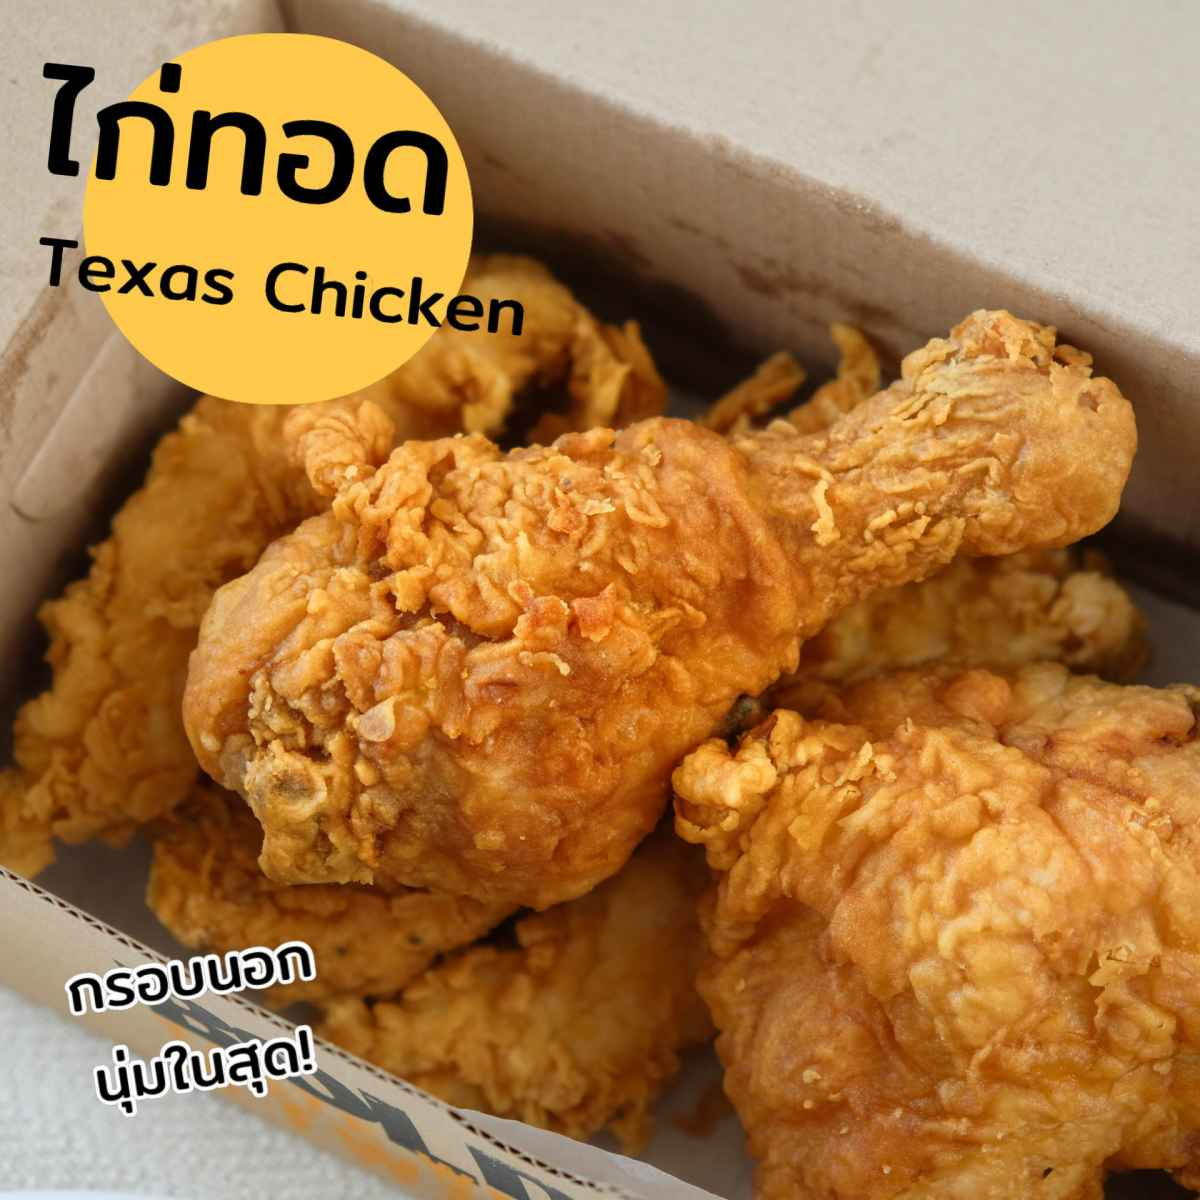 texas chicken โปรโมชั่น